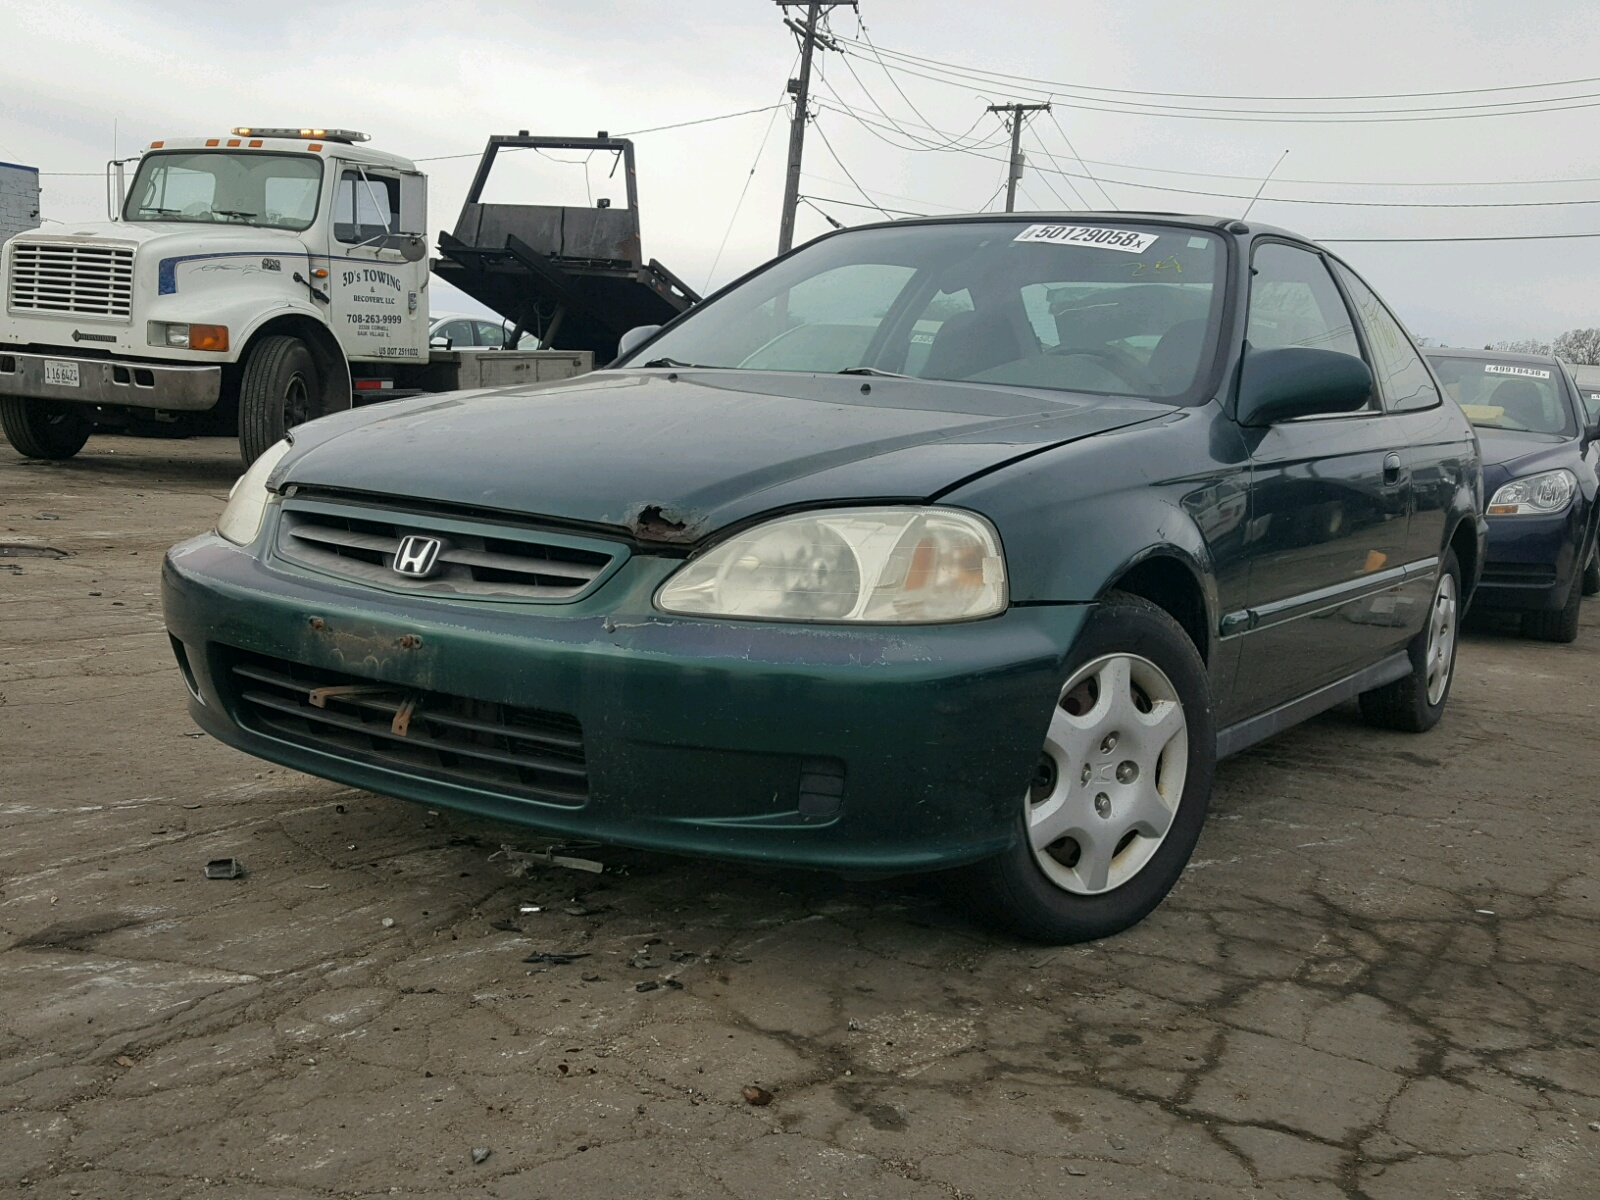 1hgej8247xl006387 1999 Green Honda Civic Ex On Sale In Il 16l Right View